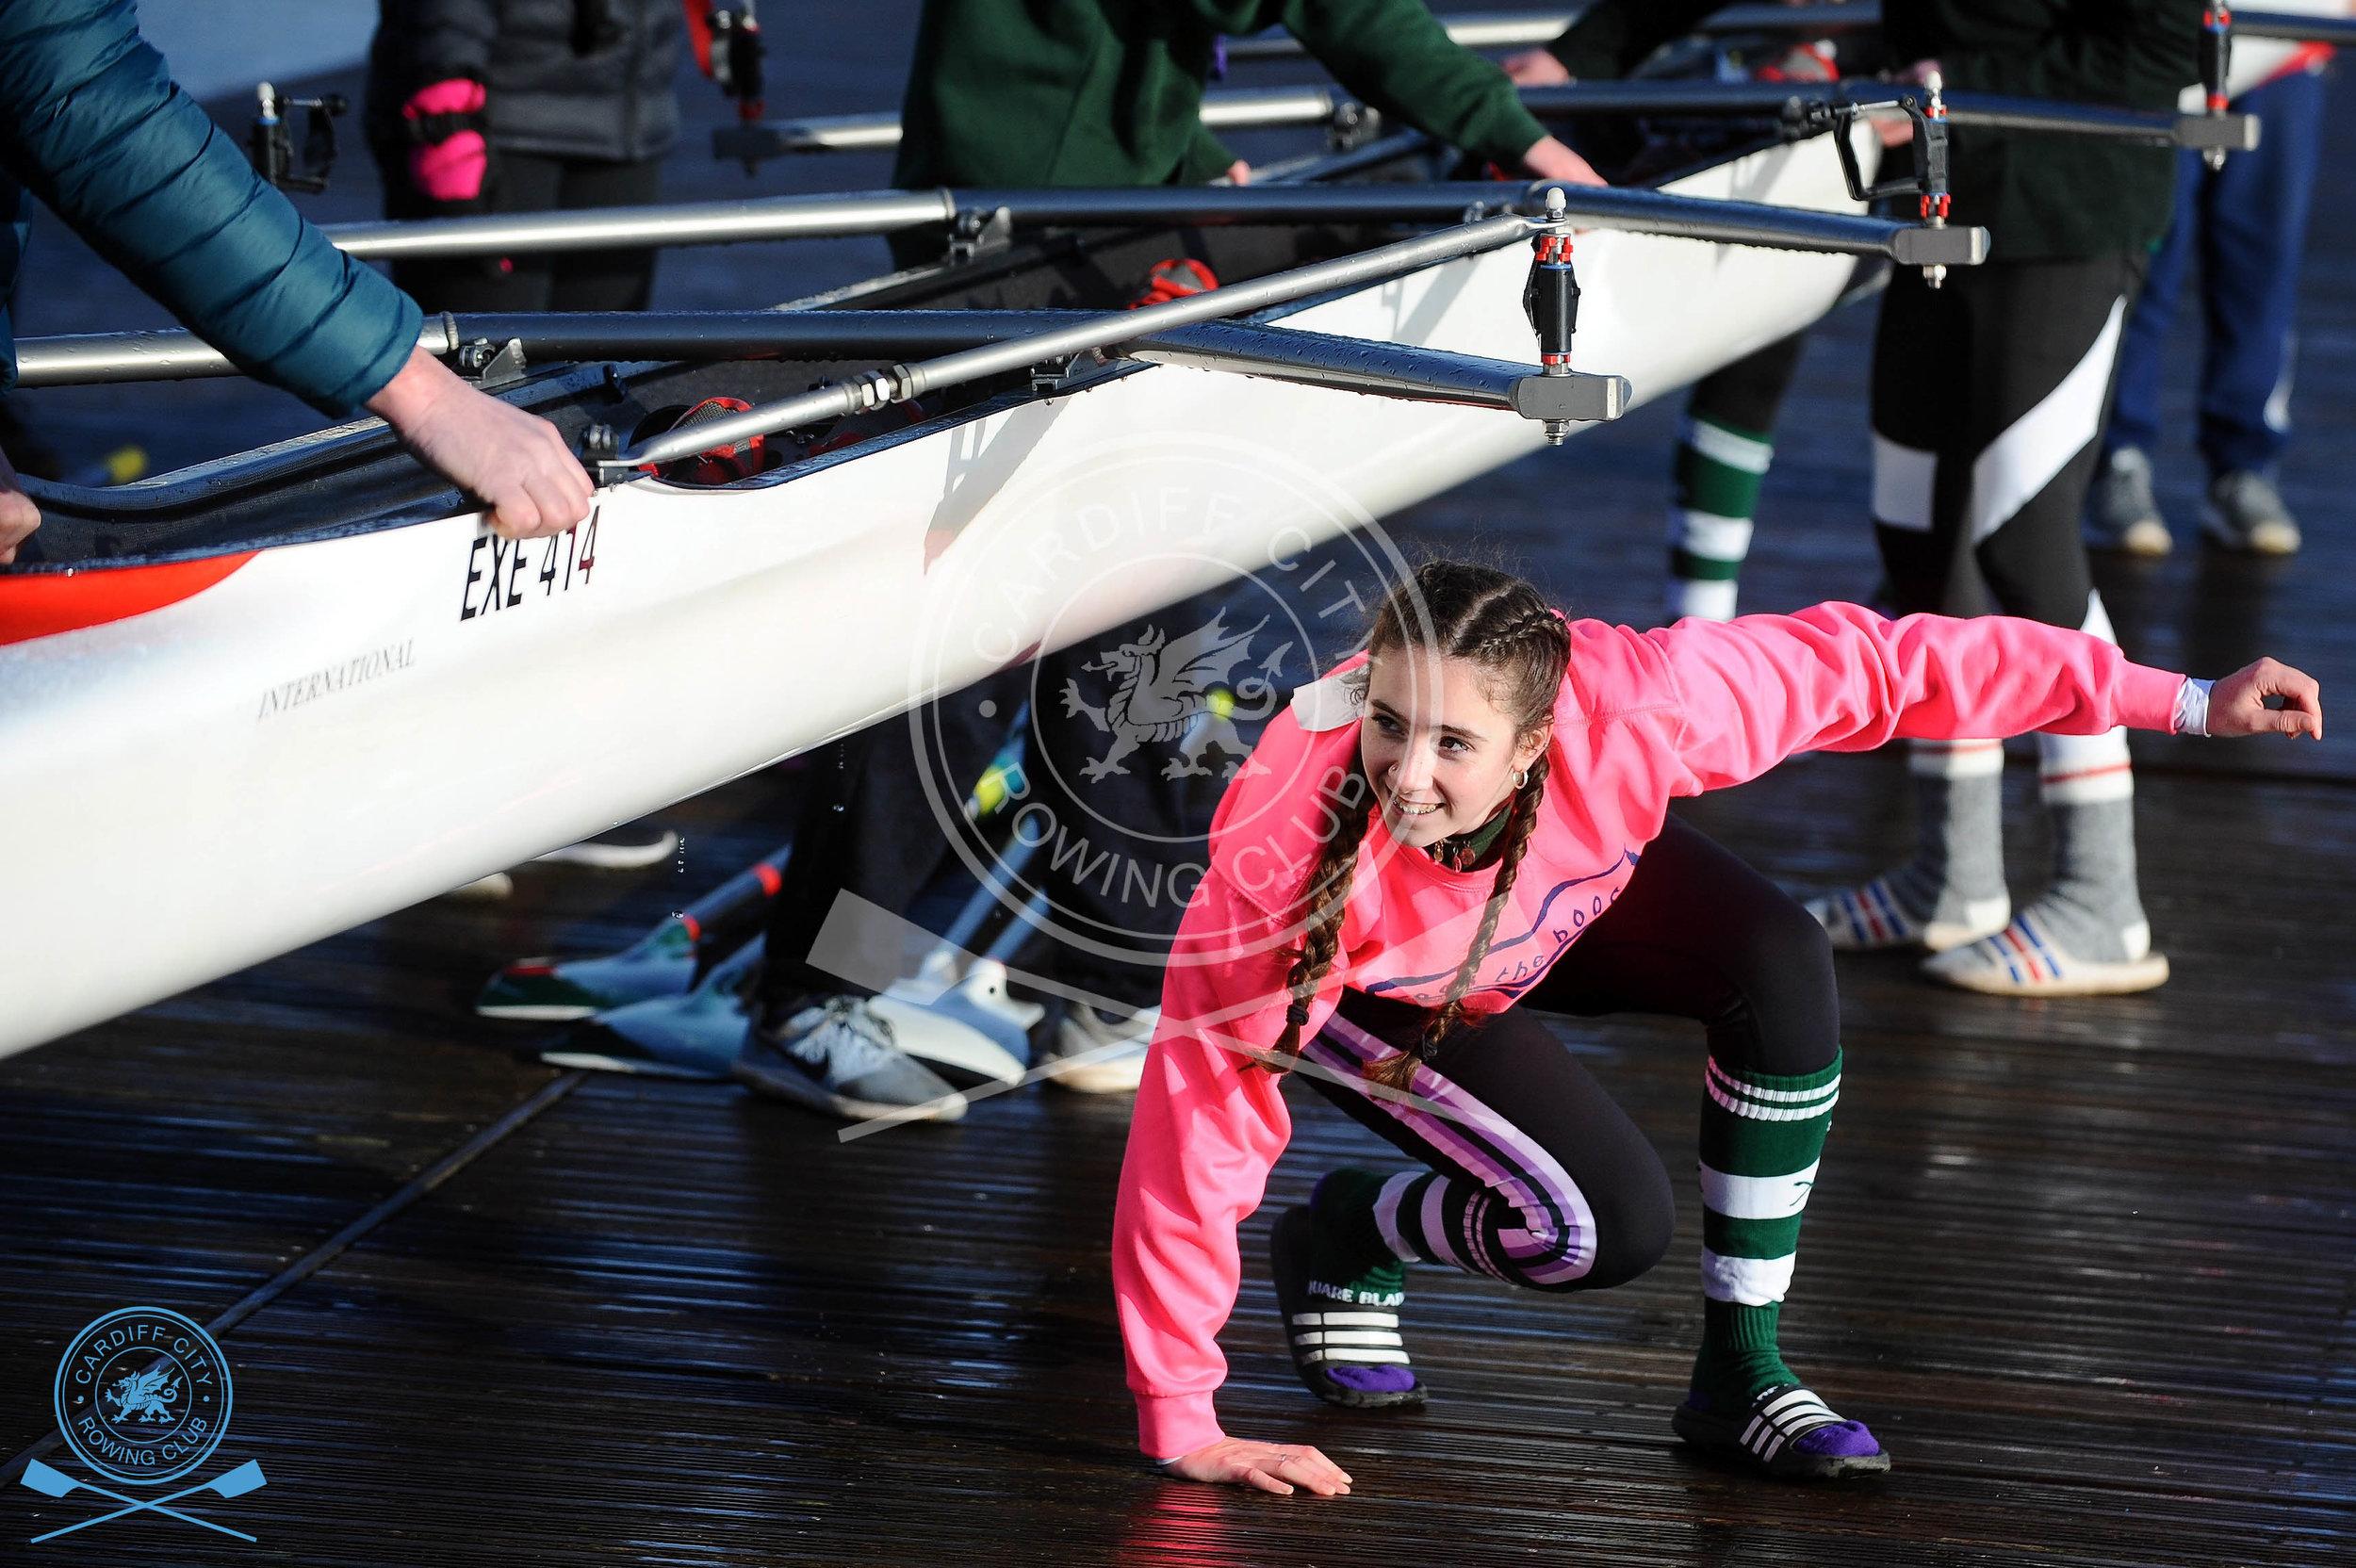 DW_280119_Cardiff_City_Rowing_357.jpg